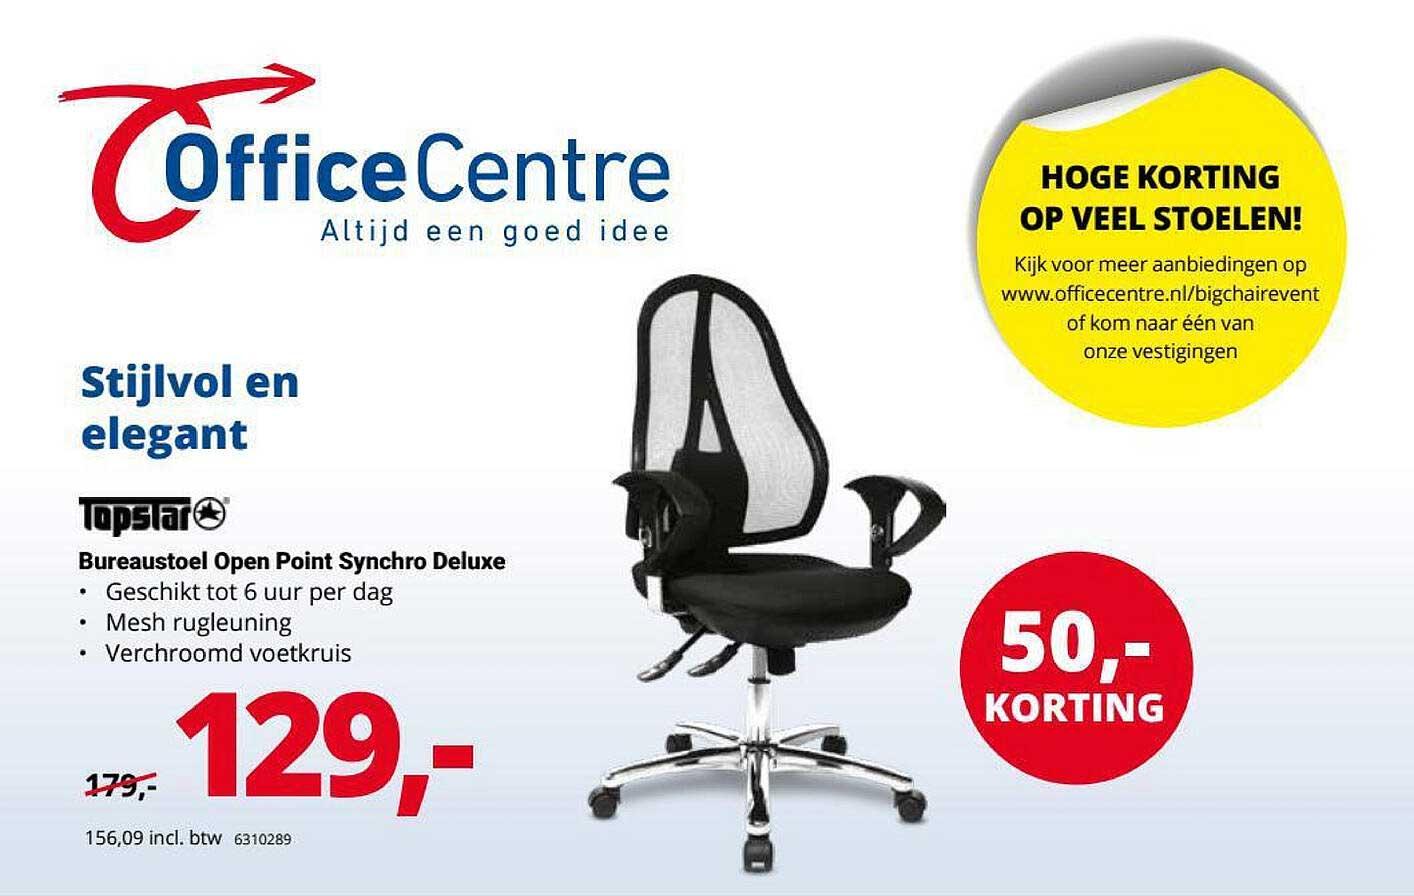 Office Centre Topstar Bureaustoel Open Point Synchro Deluxe 50,- Korting